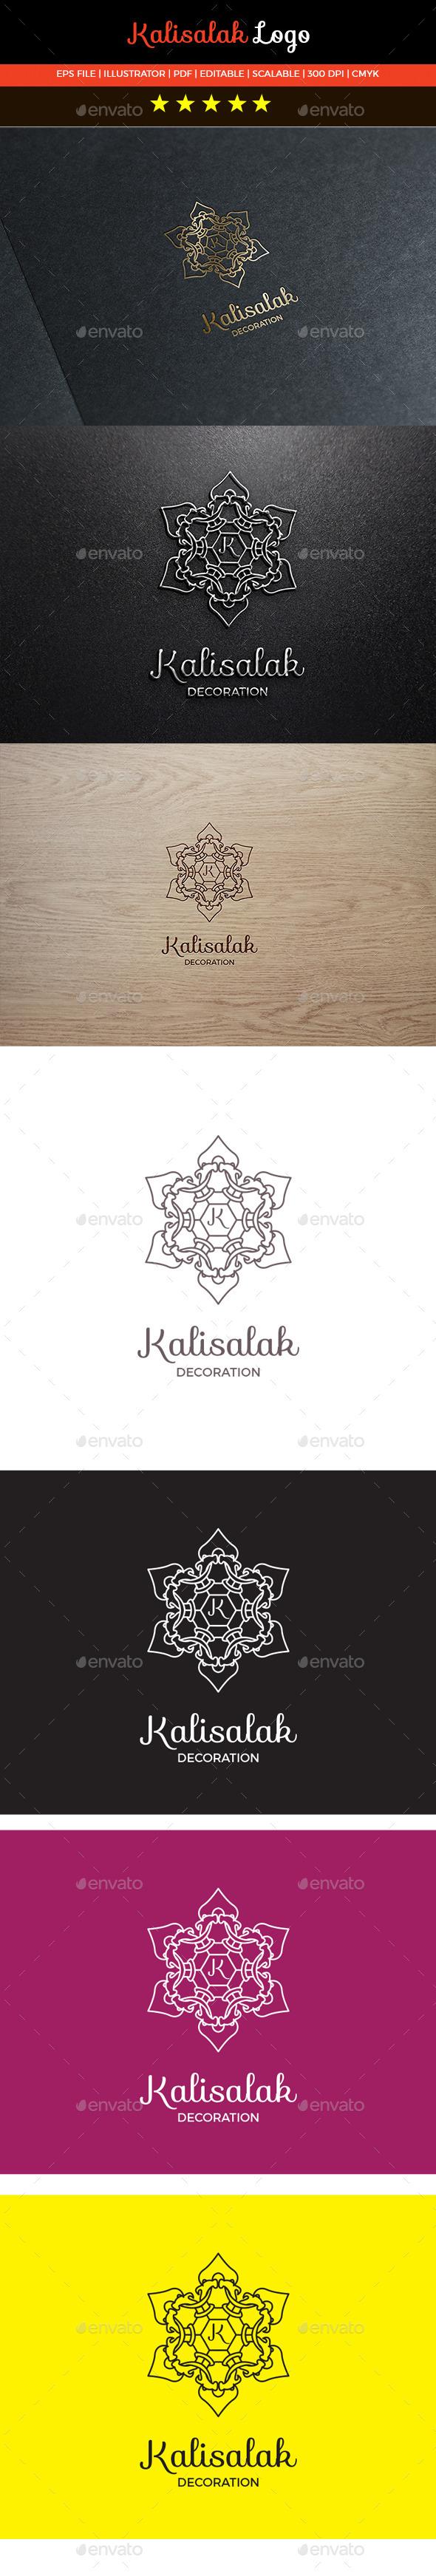 GraphicRiver Kalisalak Logo 10641167